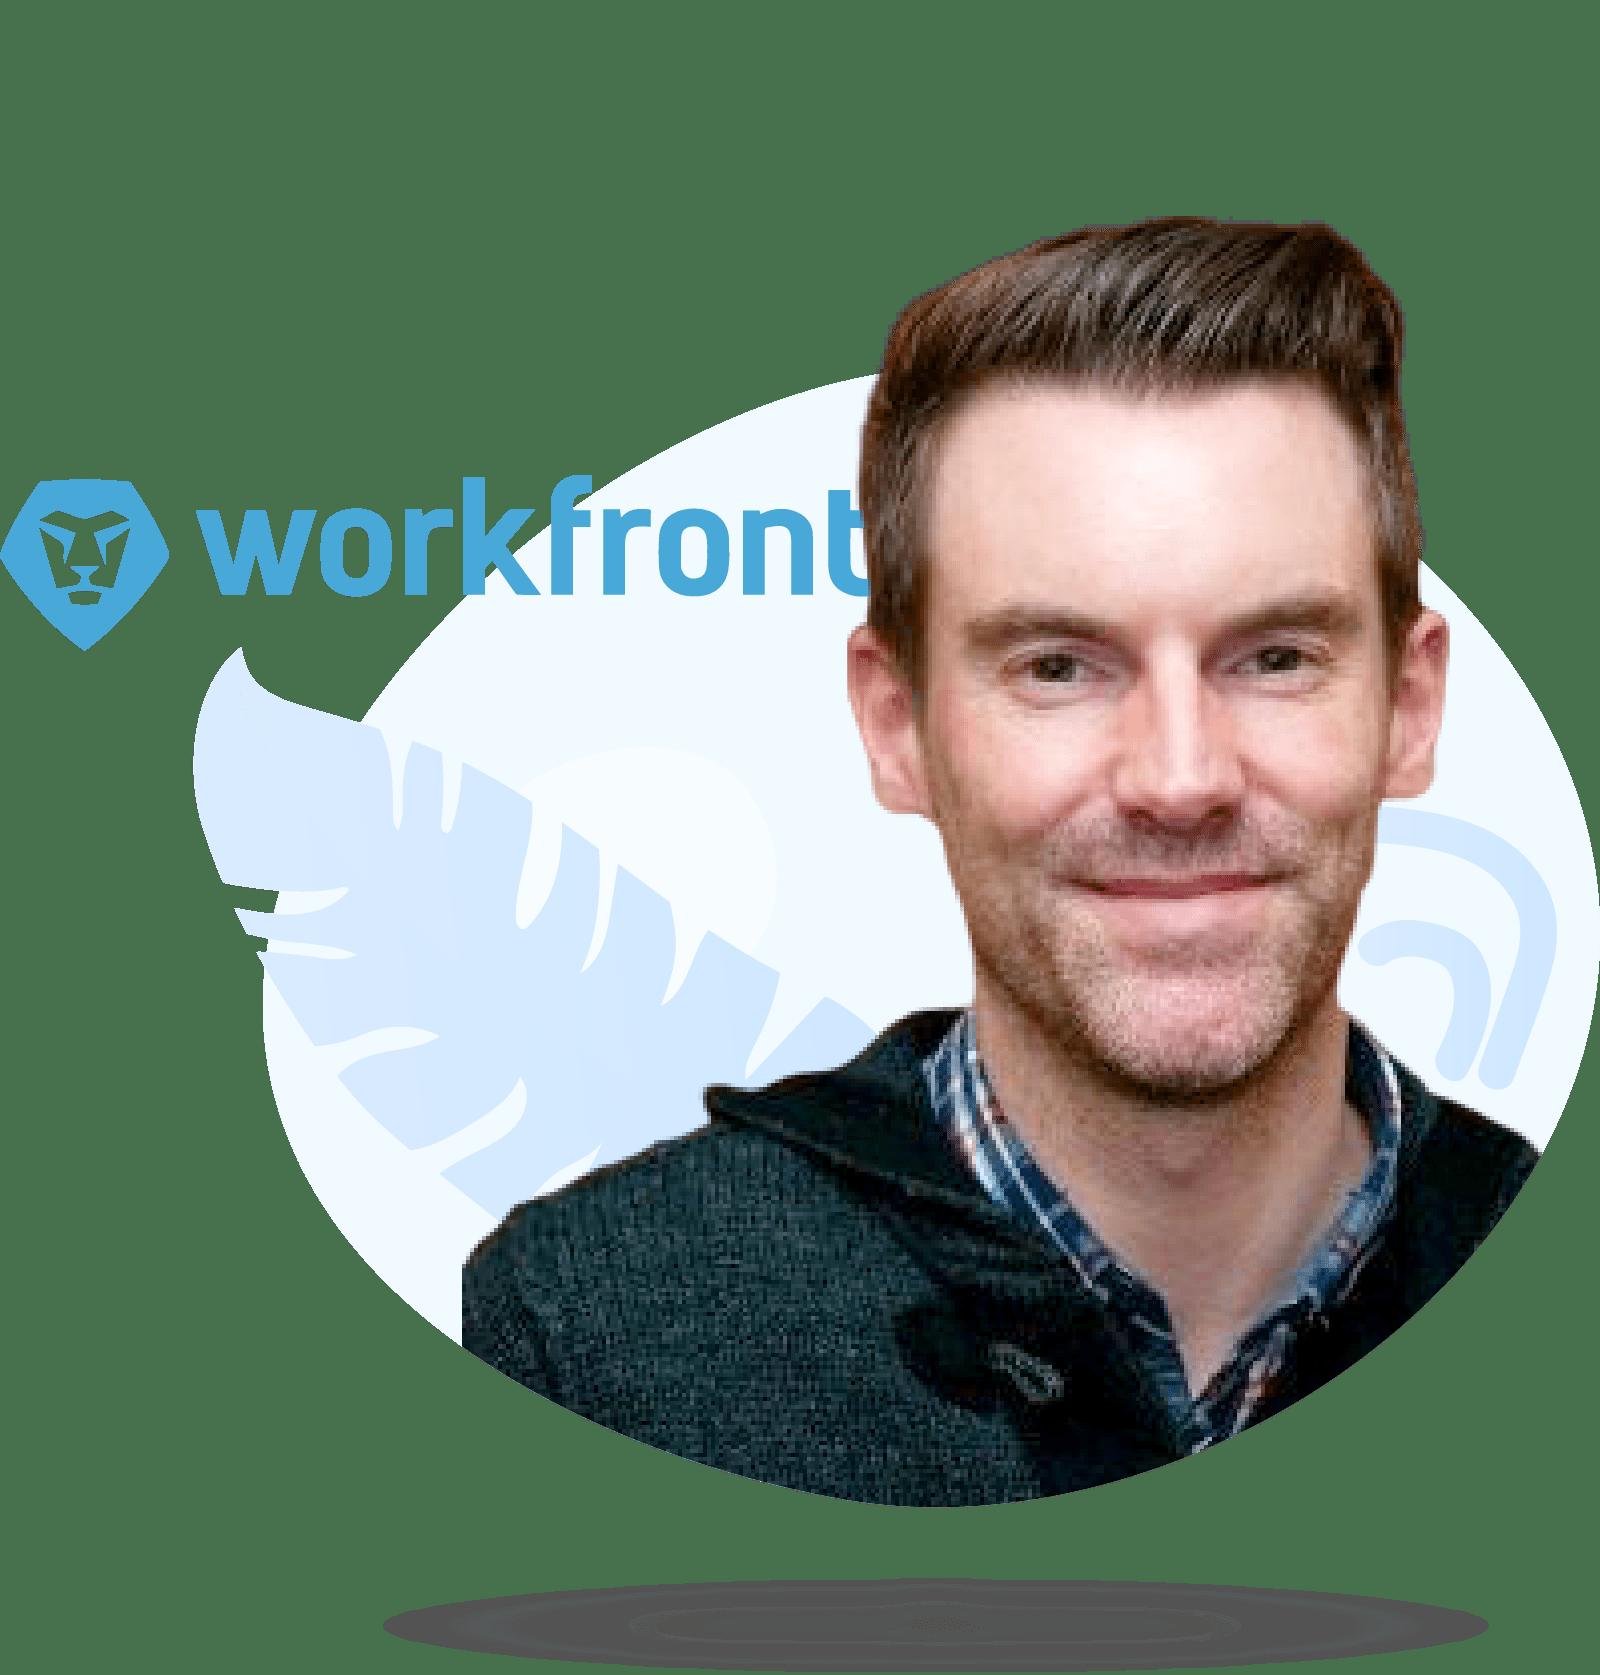 Workfront Testimonial